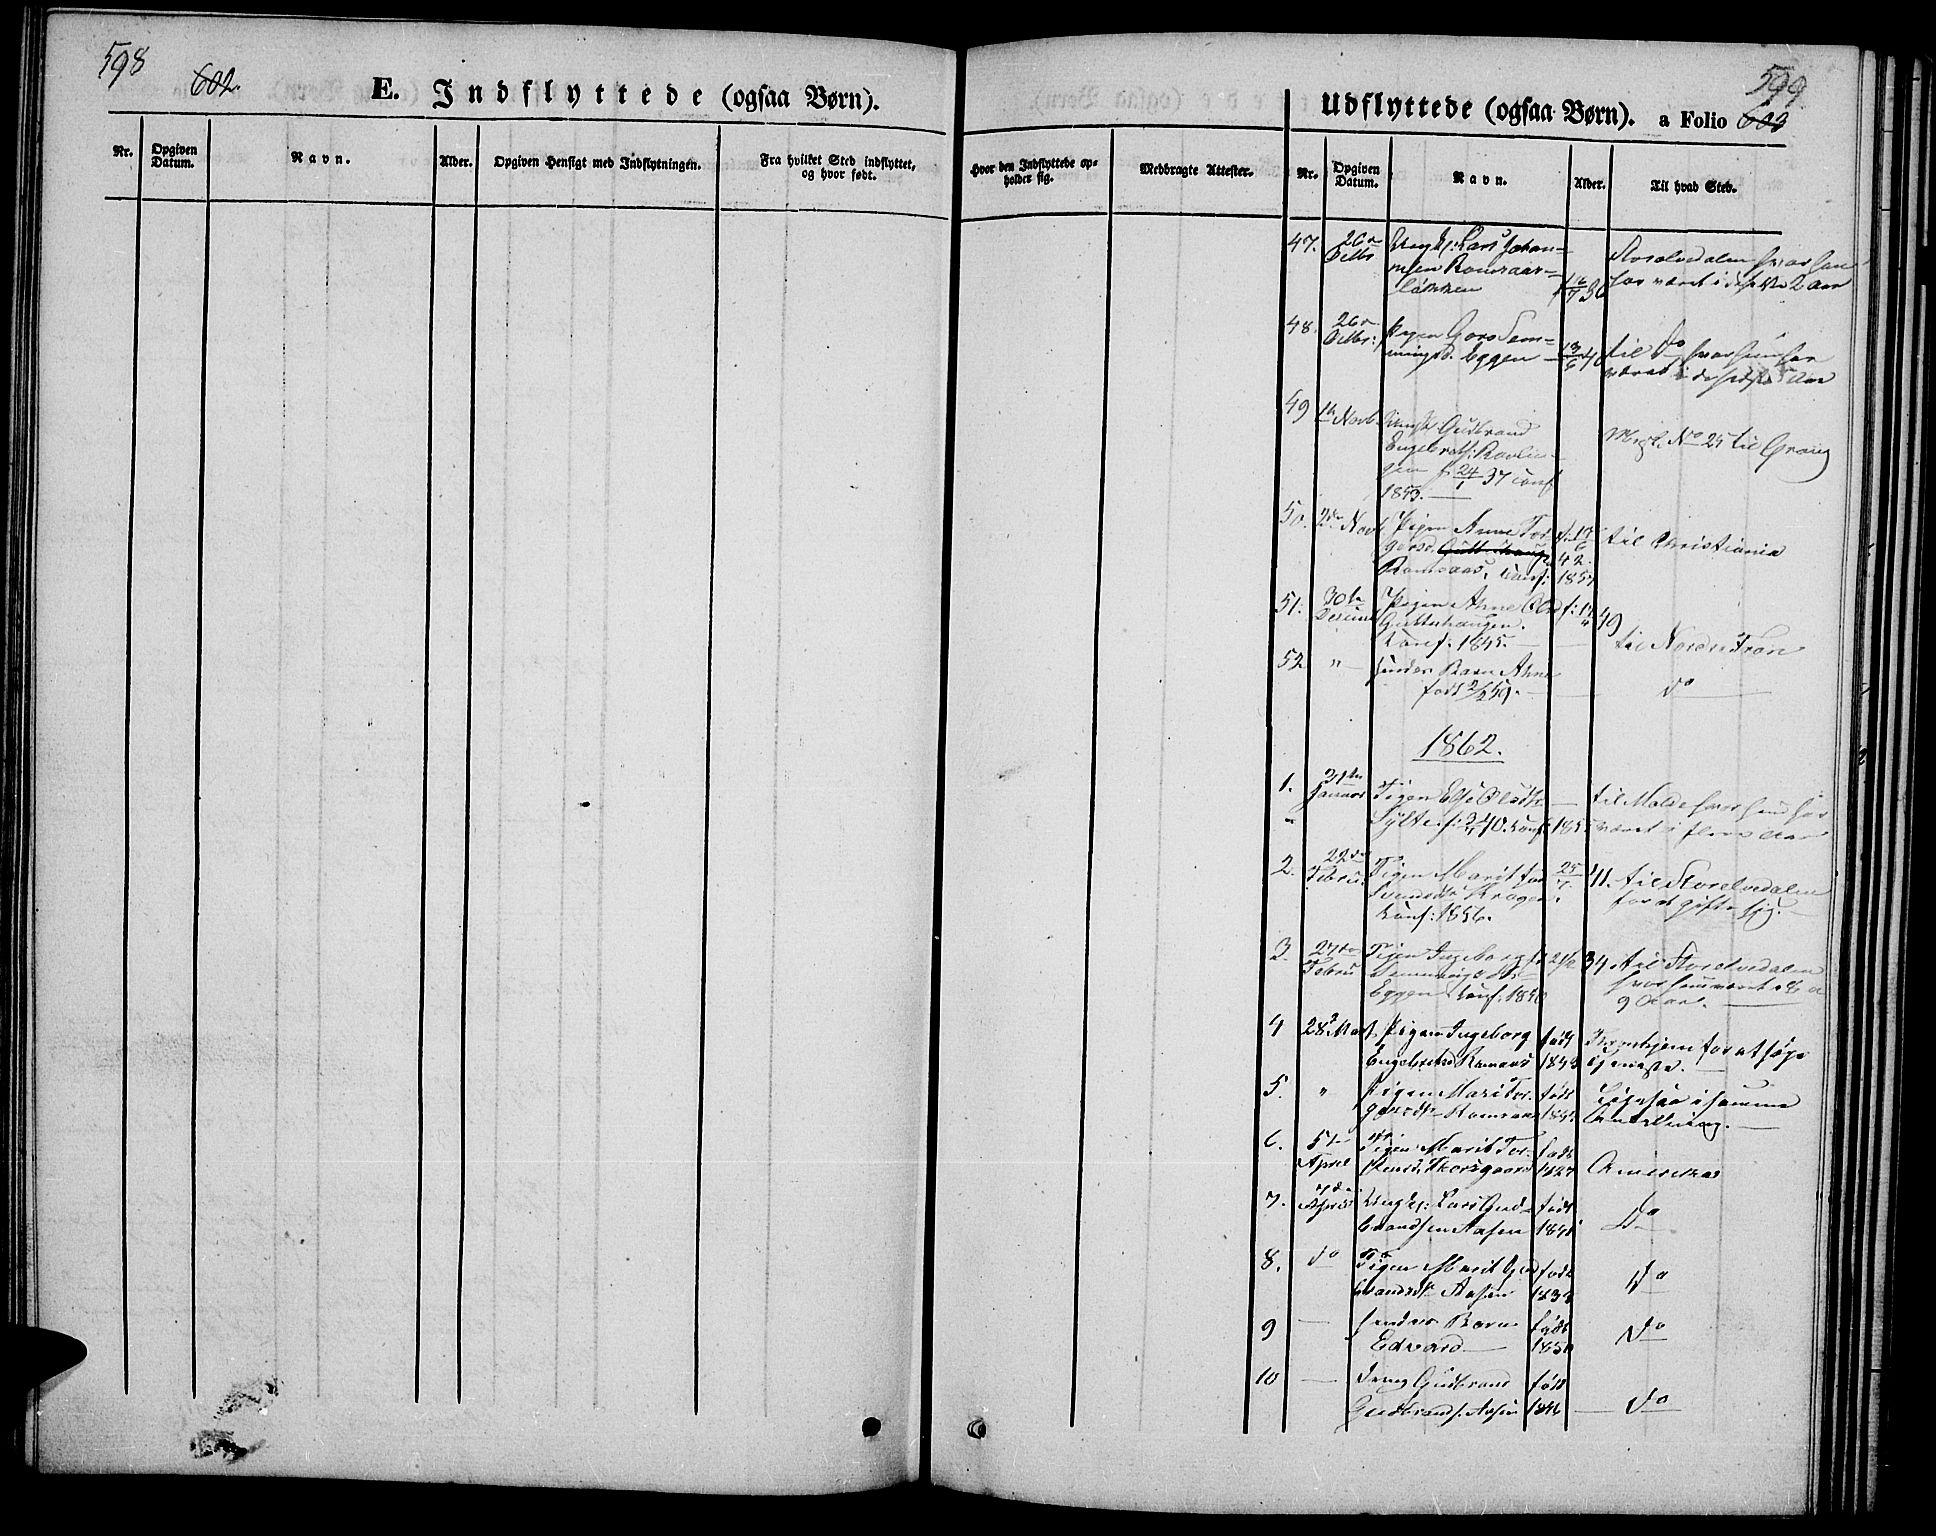 SAH, Ringebu prestekontor, Klokkerbok nr. 3, 1854-1866, s. 598-599